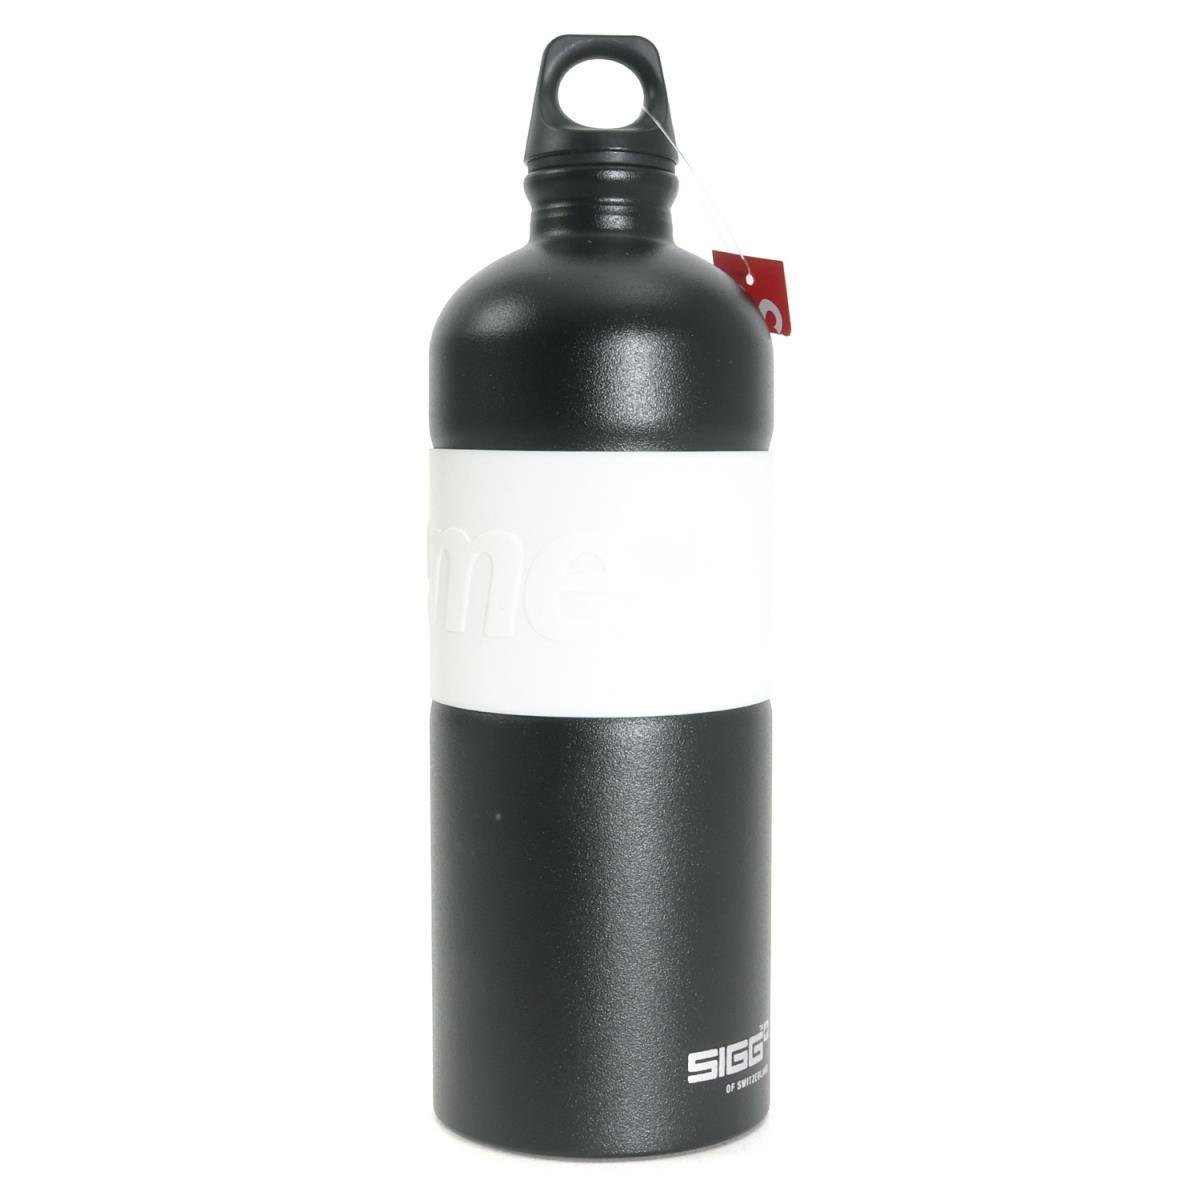 Supreme (シュプリーム) 19S/S ×SIGG ブランドロゴウォーターボトル(CYD 1.0L Water Bottle) ブラック 【メンズ】【K2198】【あす楽☆対応可】